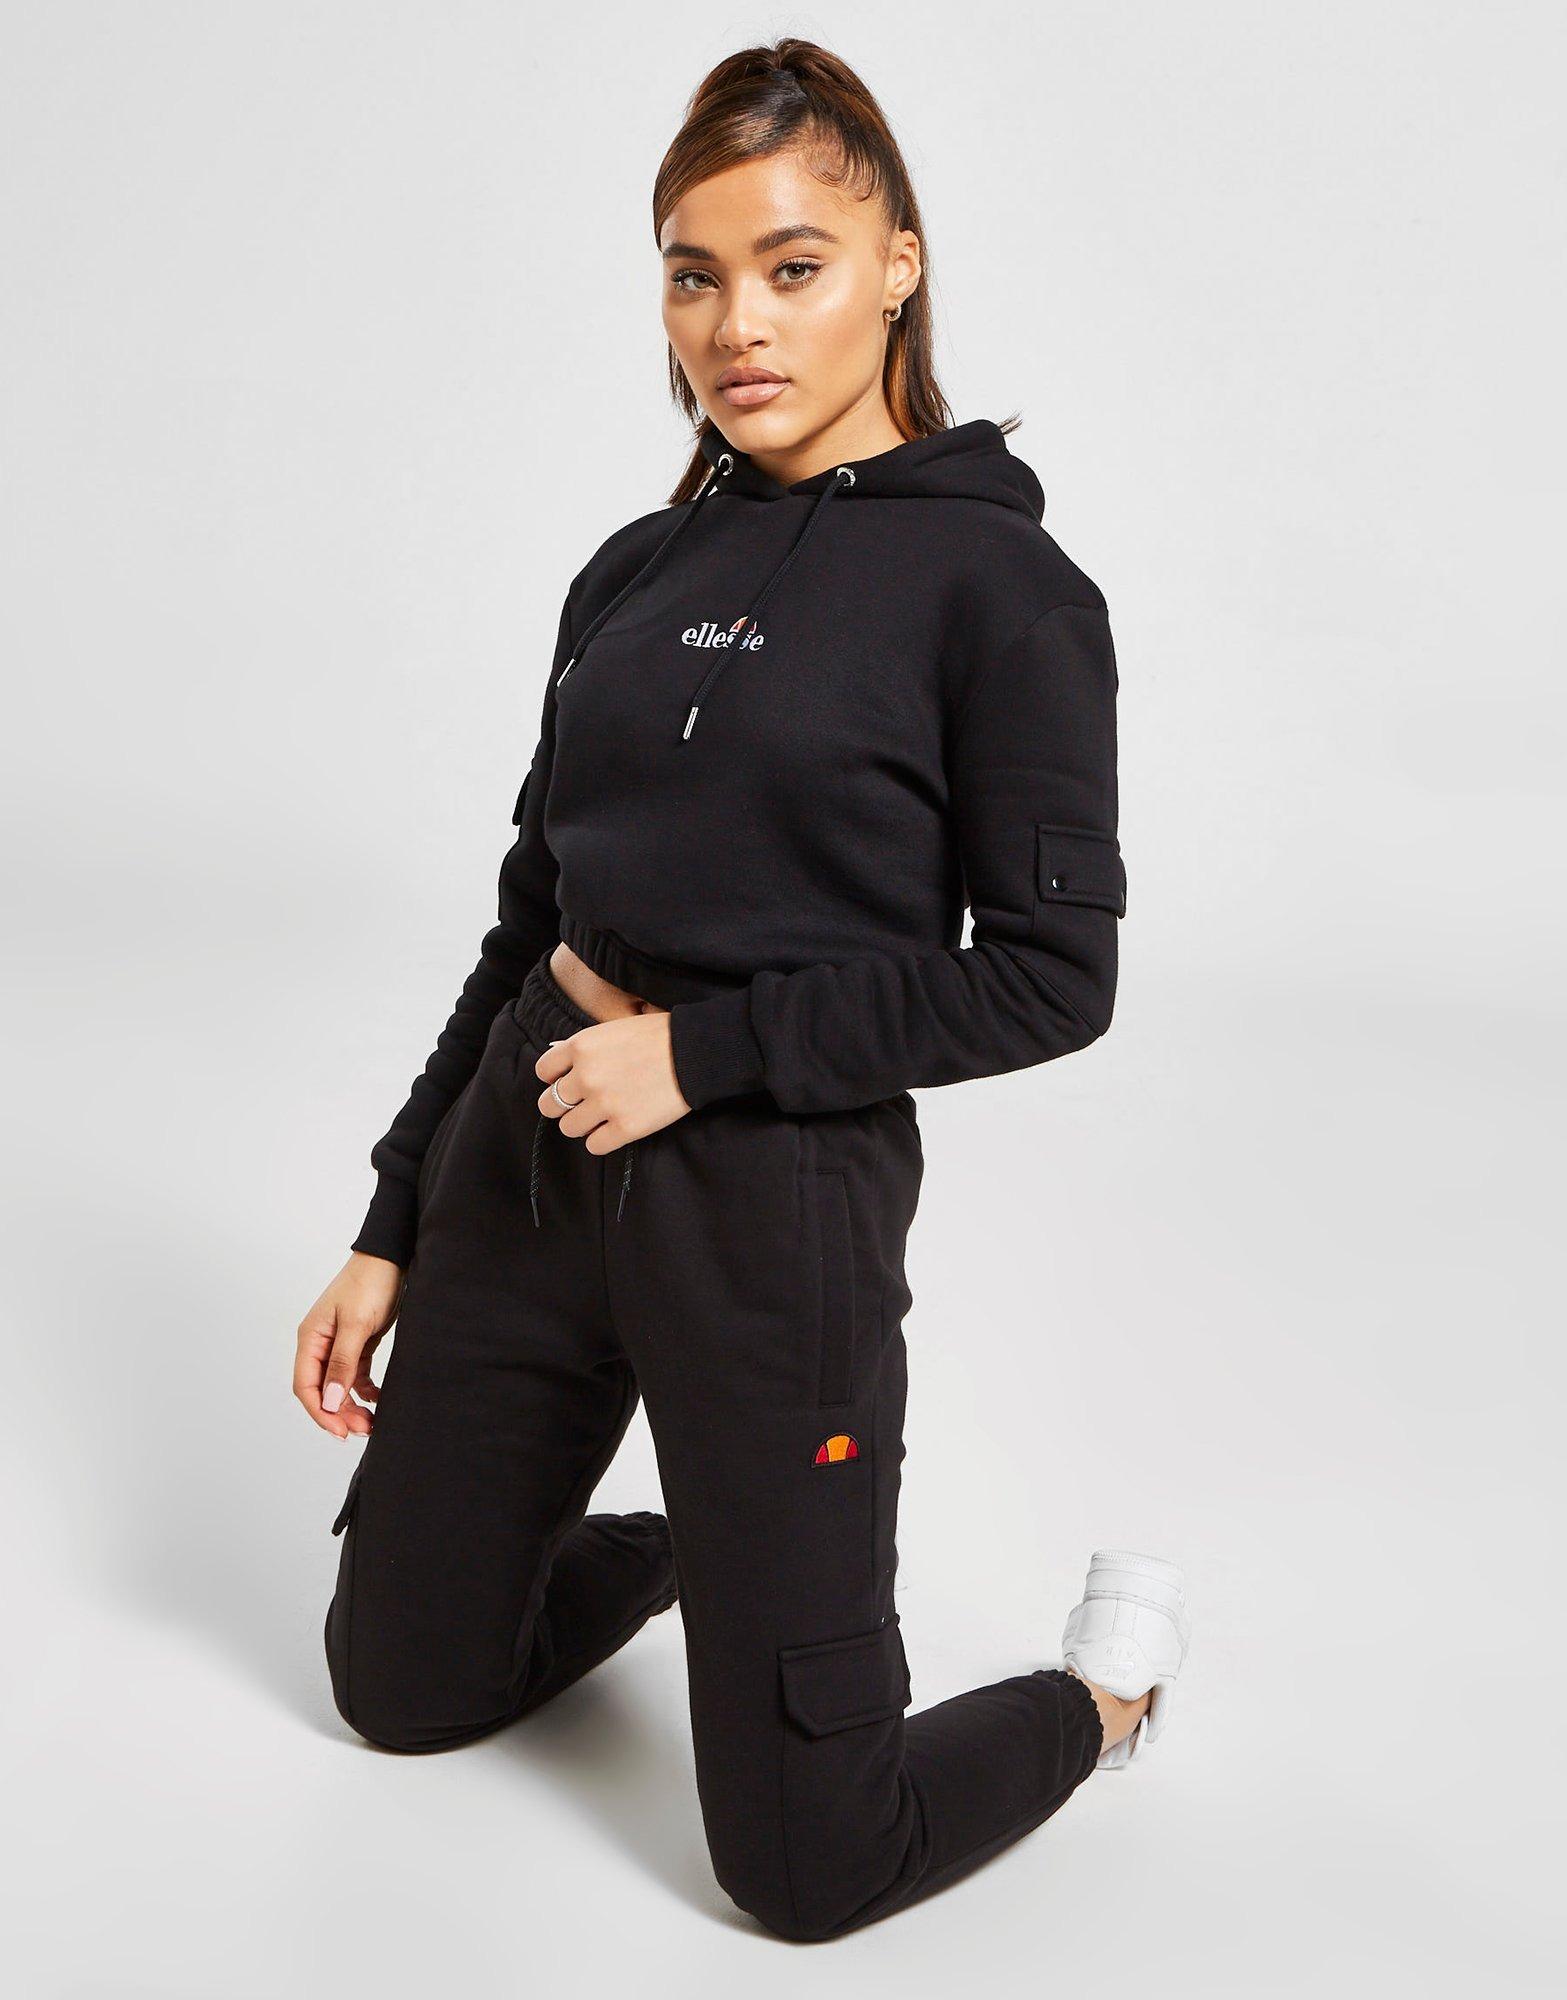 Acheter Gris Ellesse Jogging Cargo Fleece Femme | JD Sports